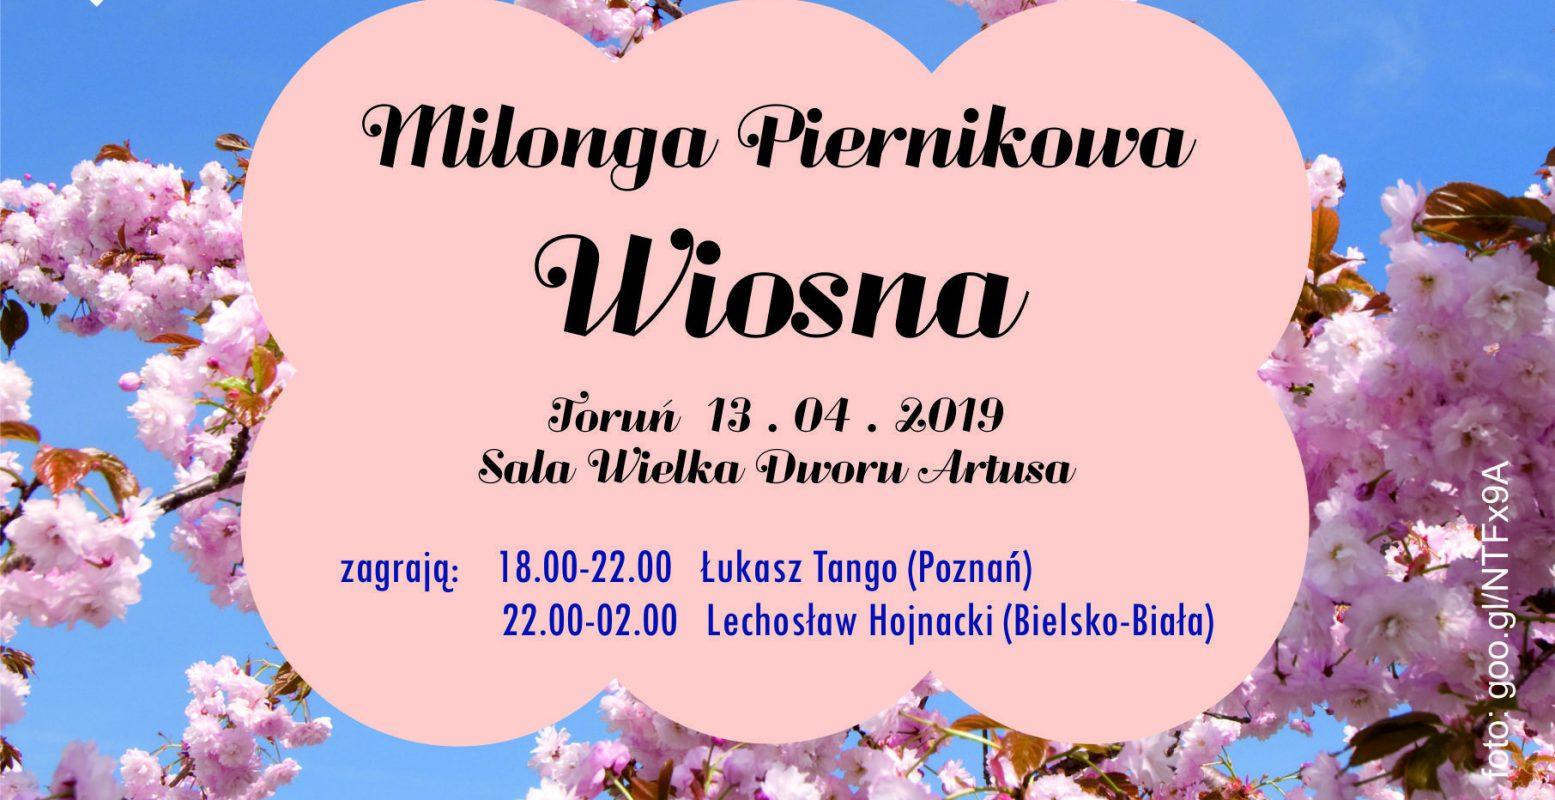 Milonga Piernikowa - Wiosna 2019